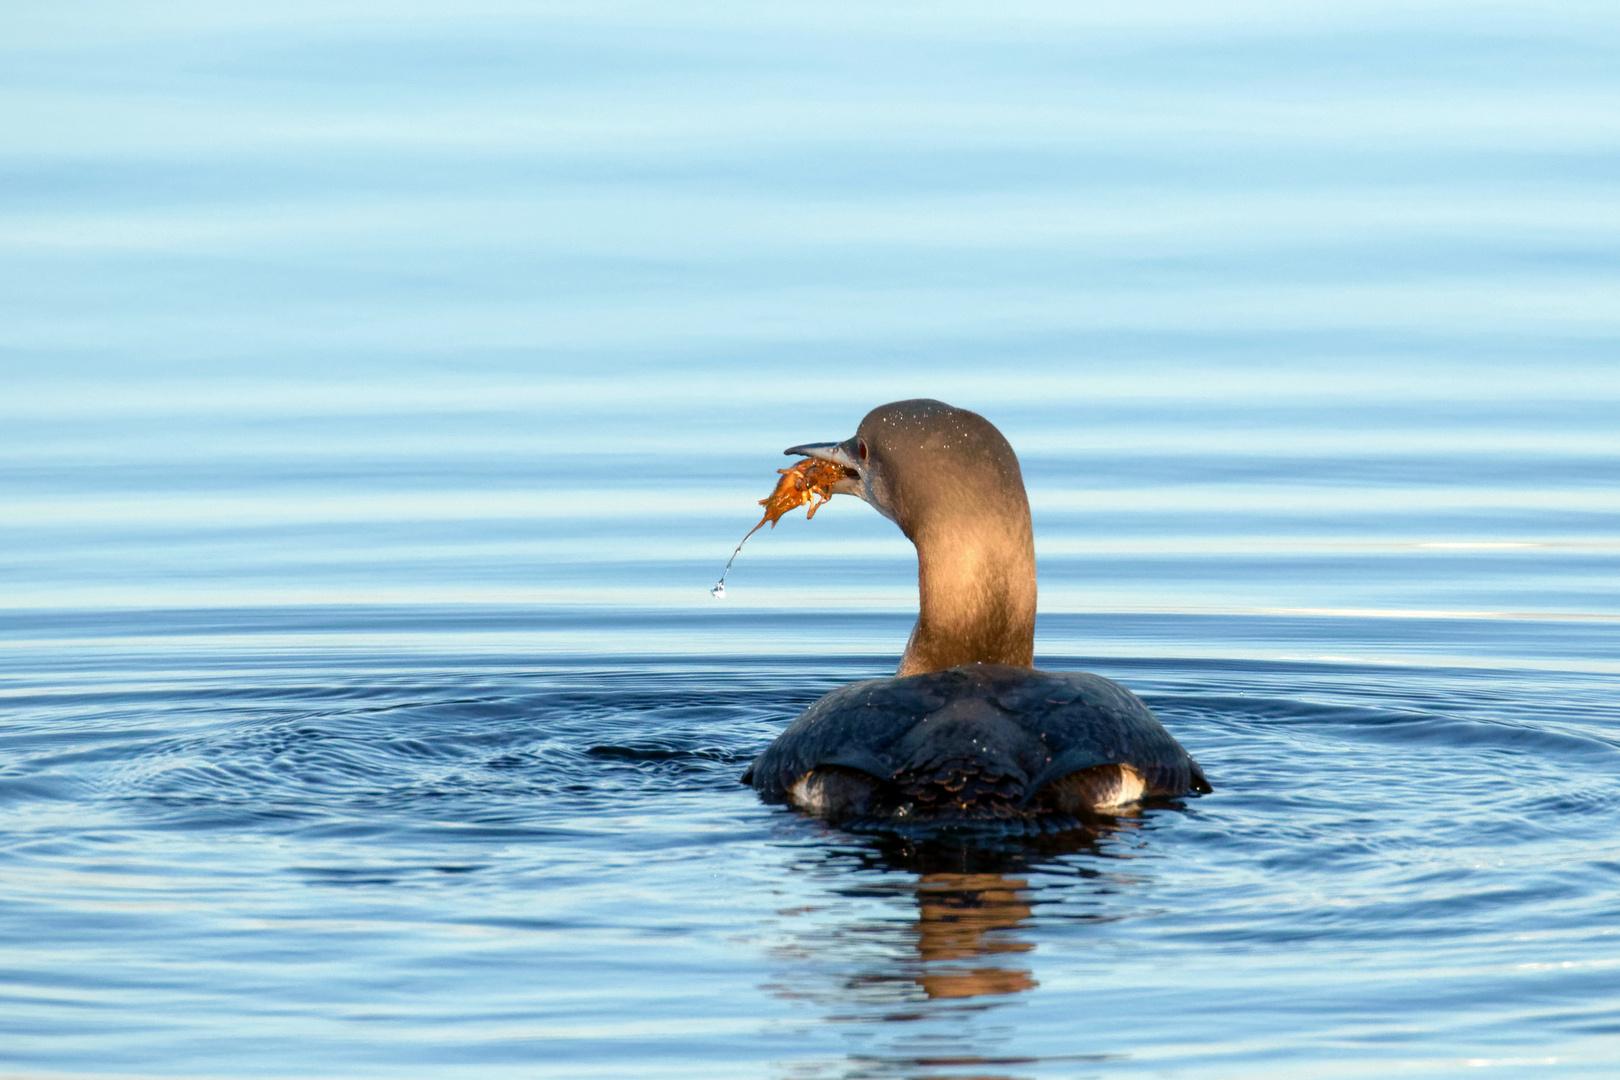 Der Feinschmecker - Prachttaucher (Gavia arctica) mit Flußkrebs!